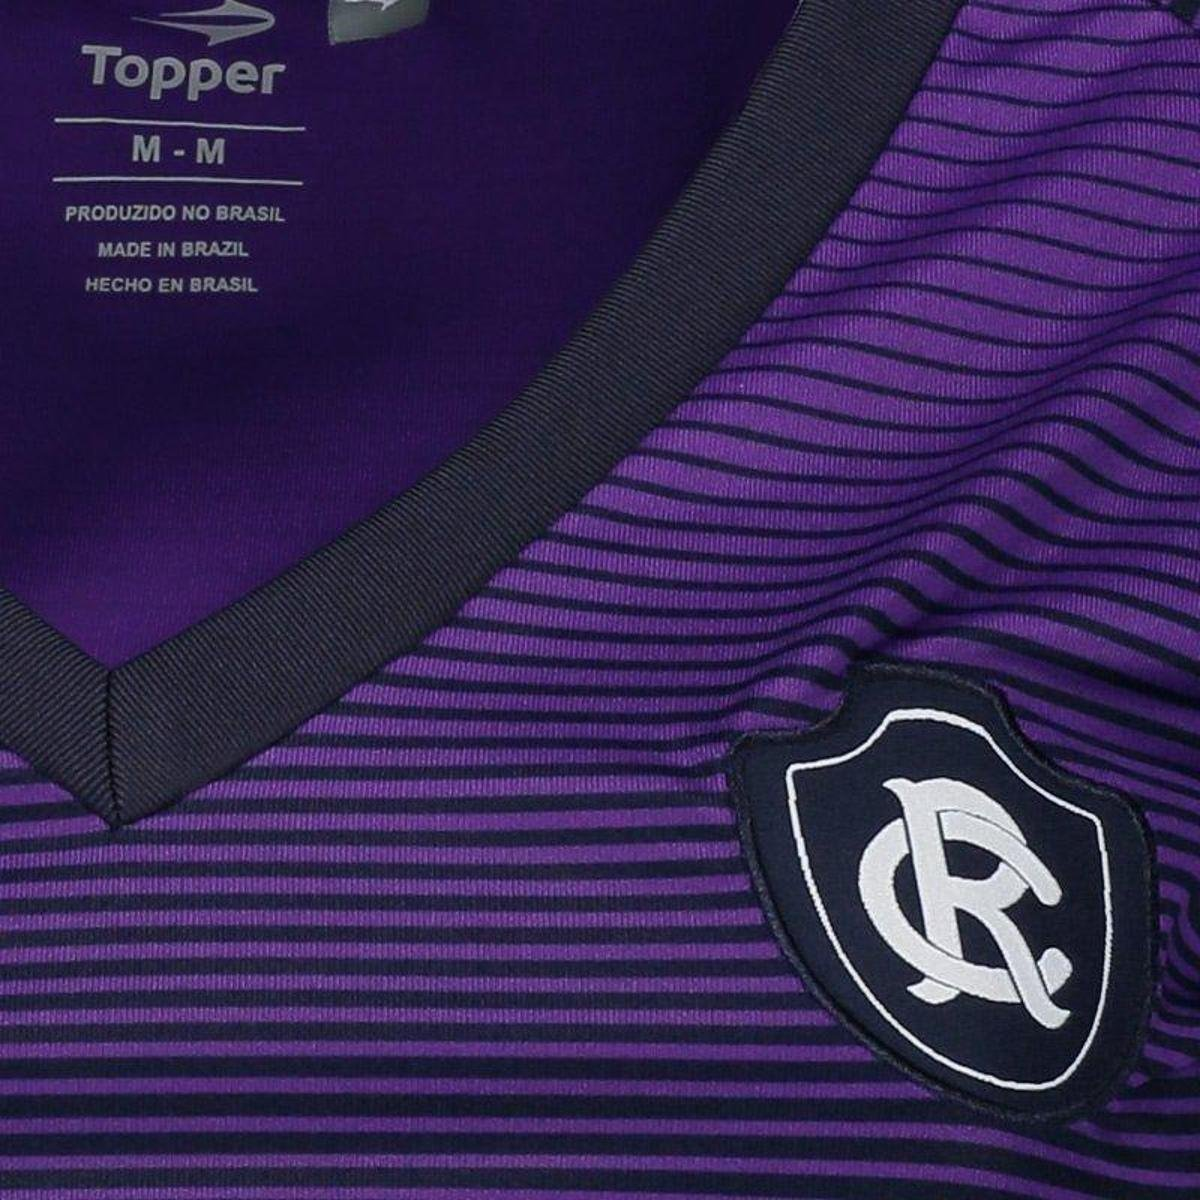 Topper Camisa 2017 Roxo III Camisa Topper Feminina Remo OFwE5q